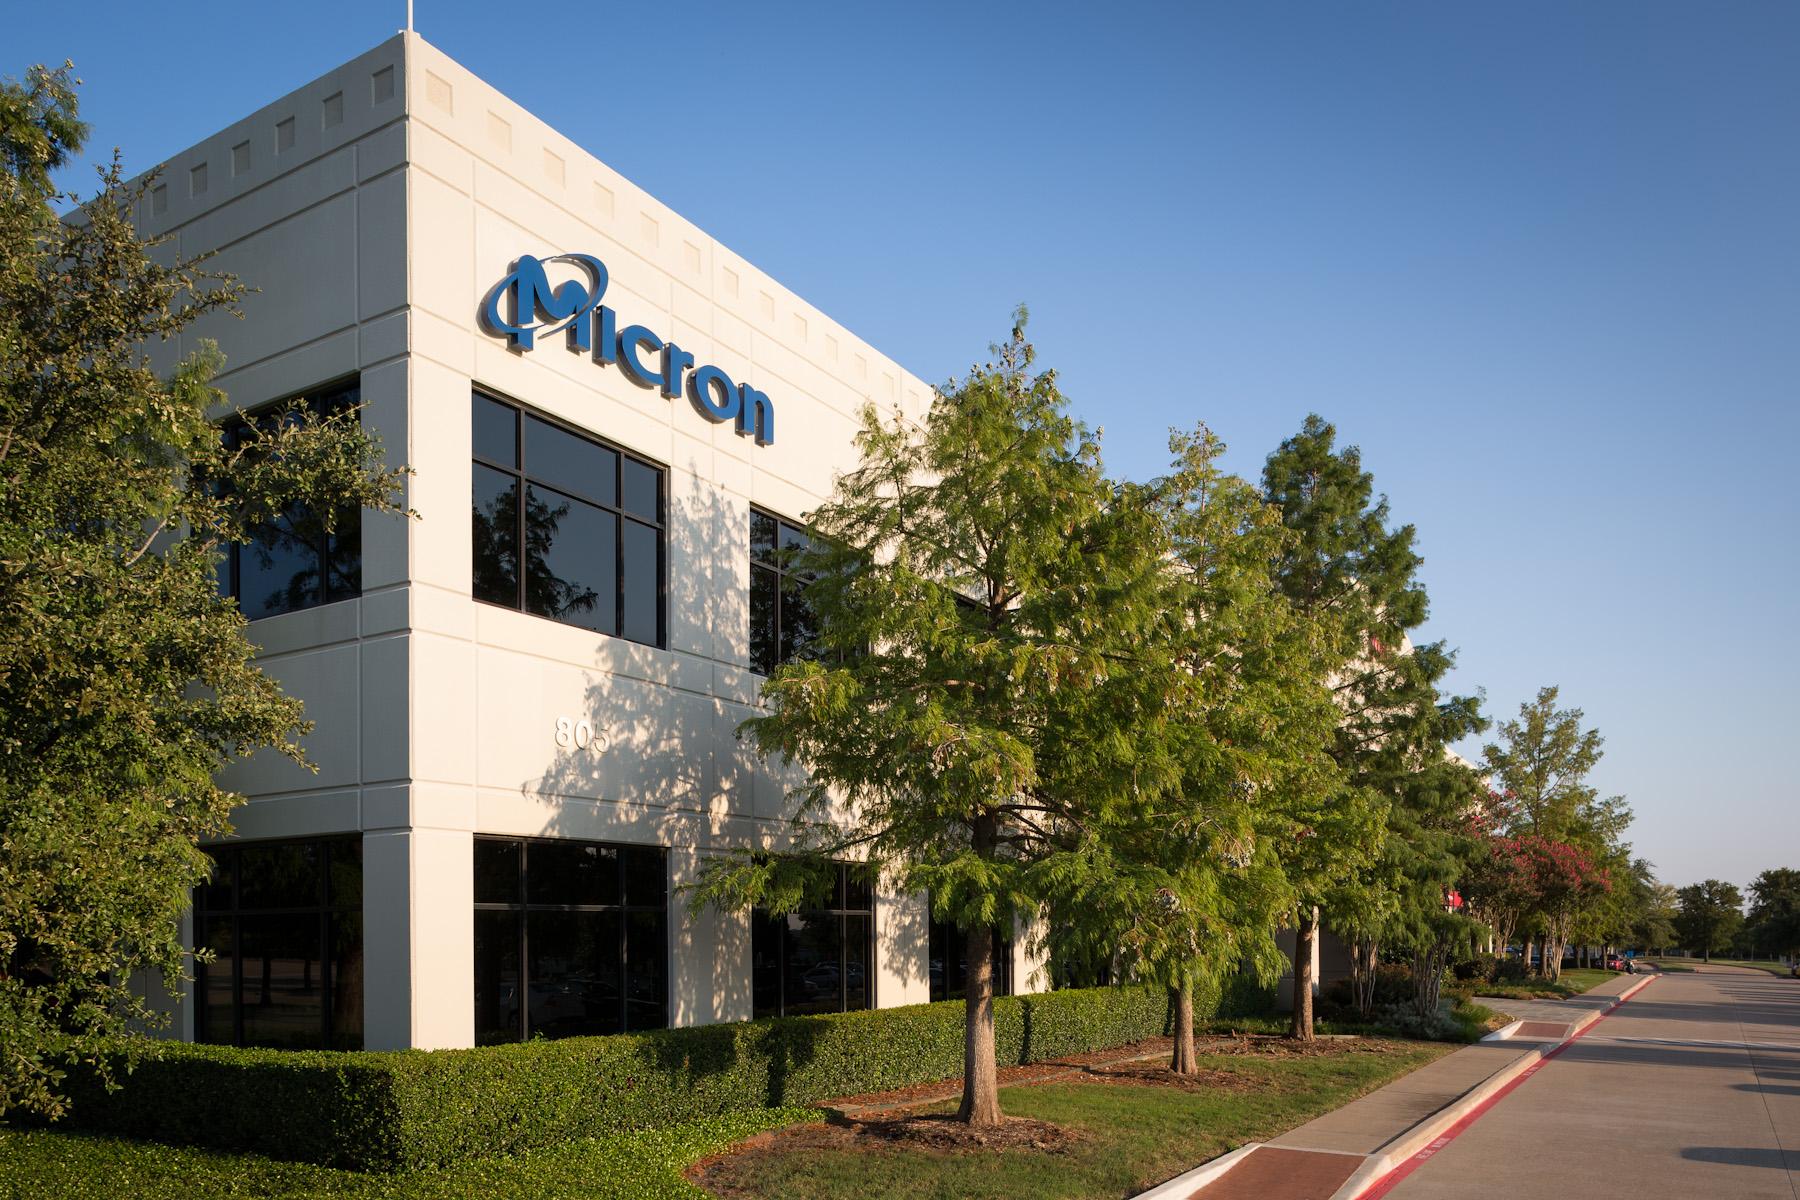 Micron building in Allen, Texas.